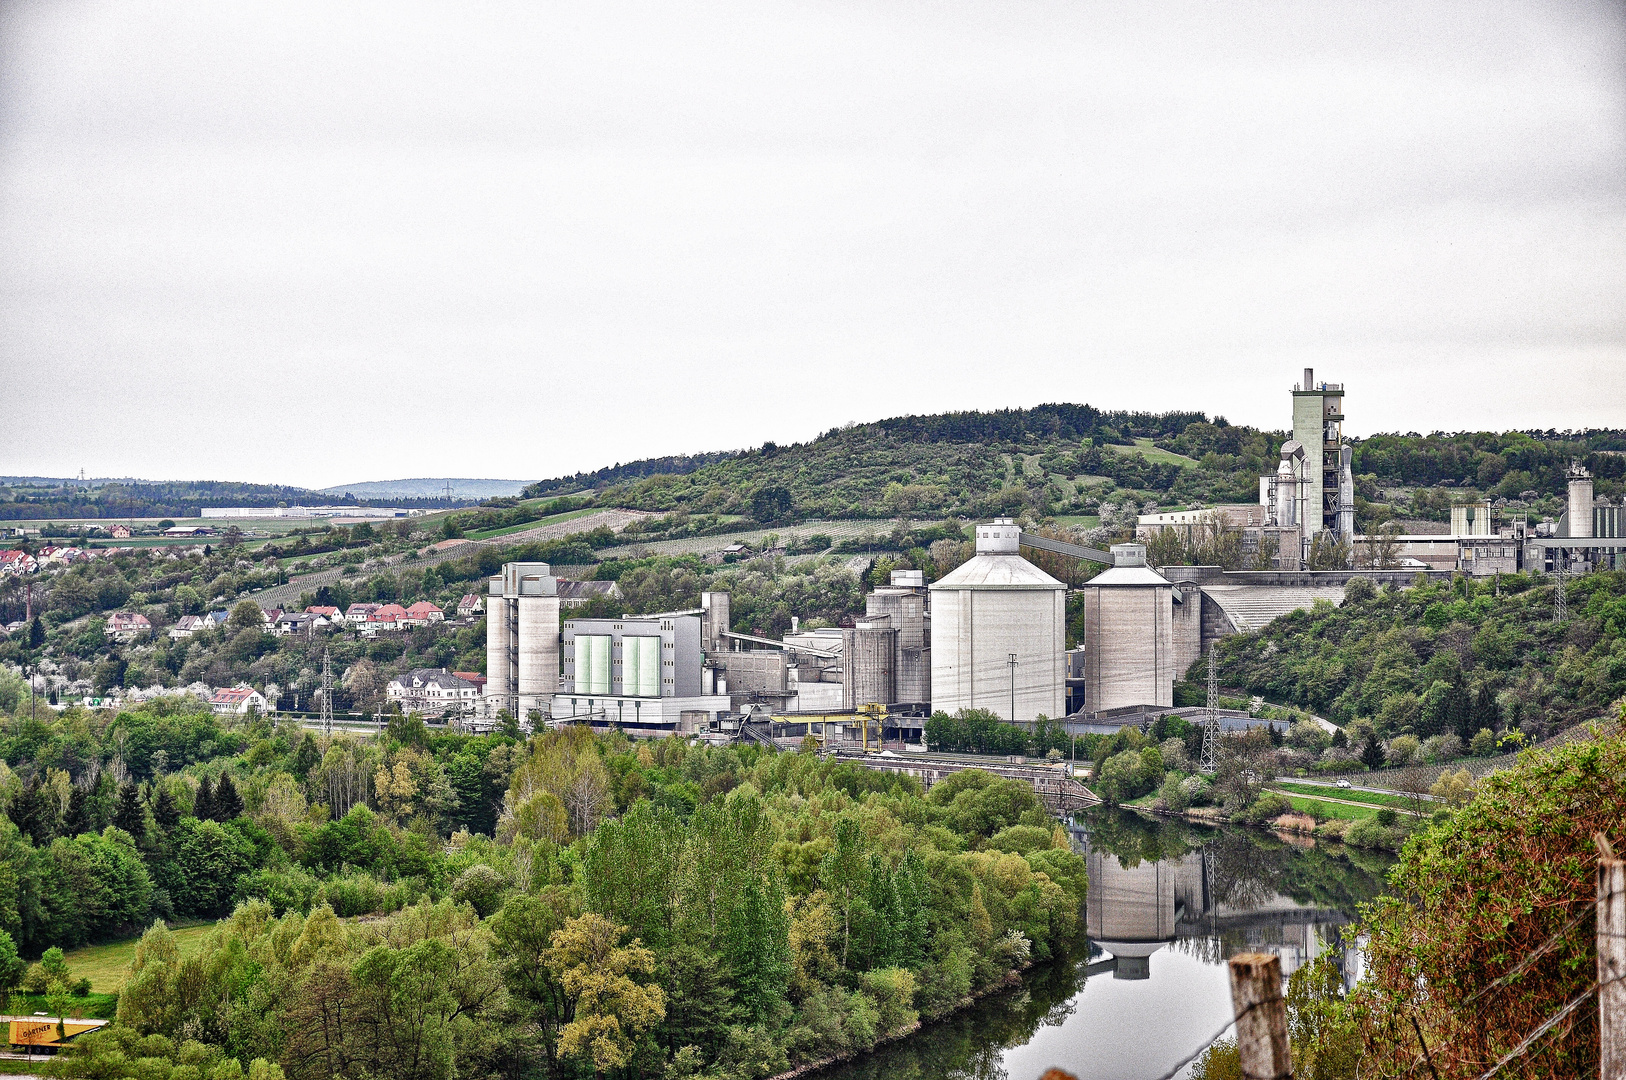 Zementwerk Lengfurt am Main